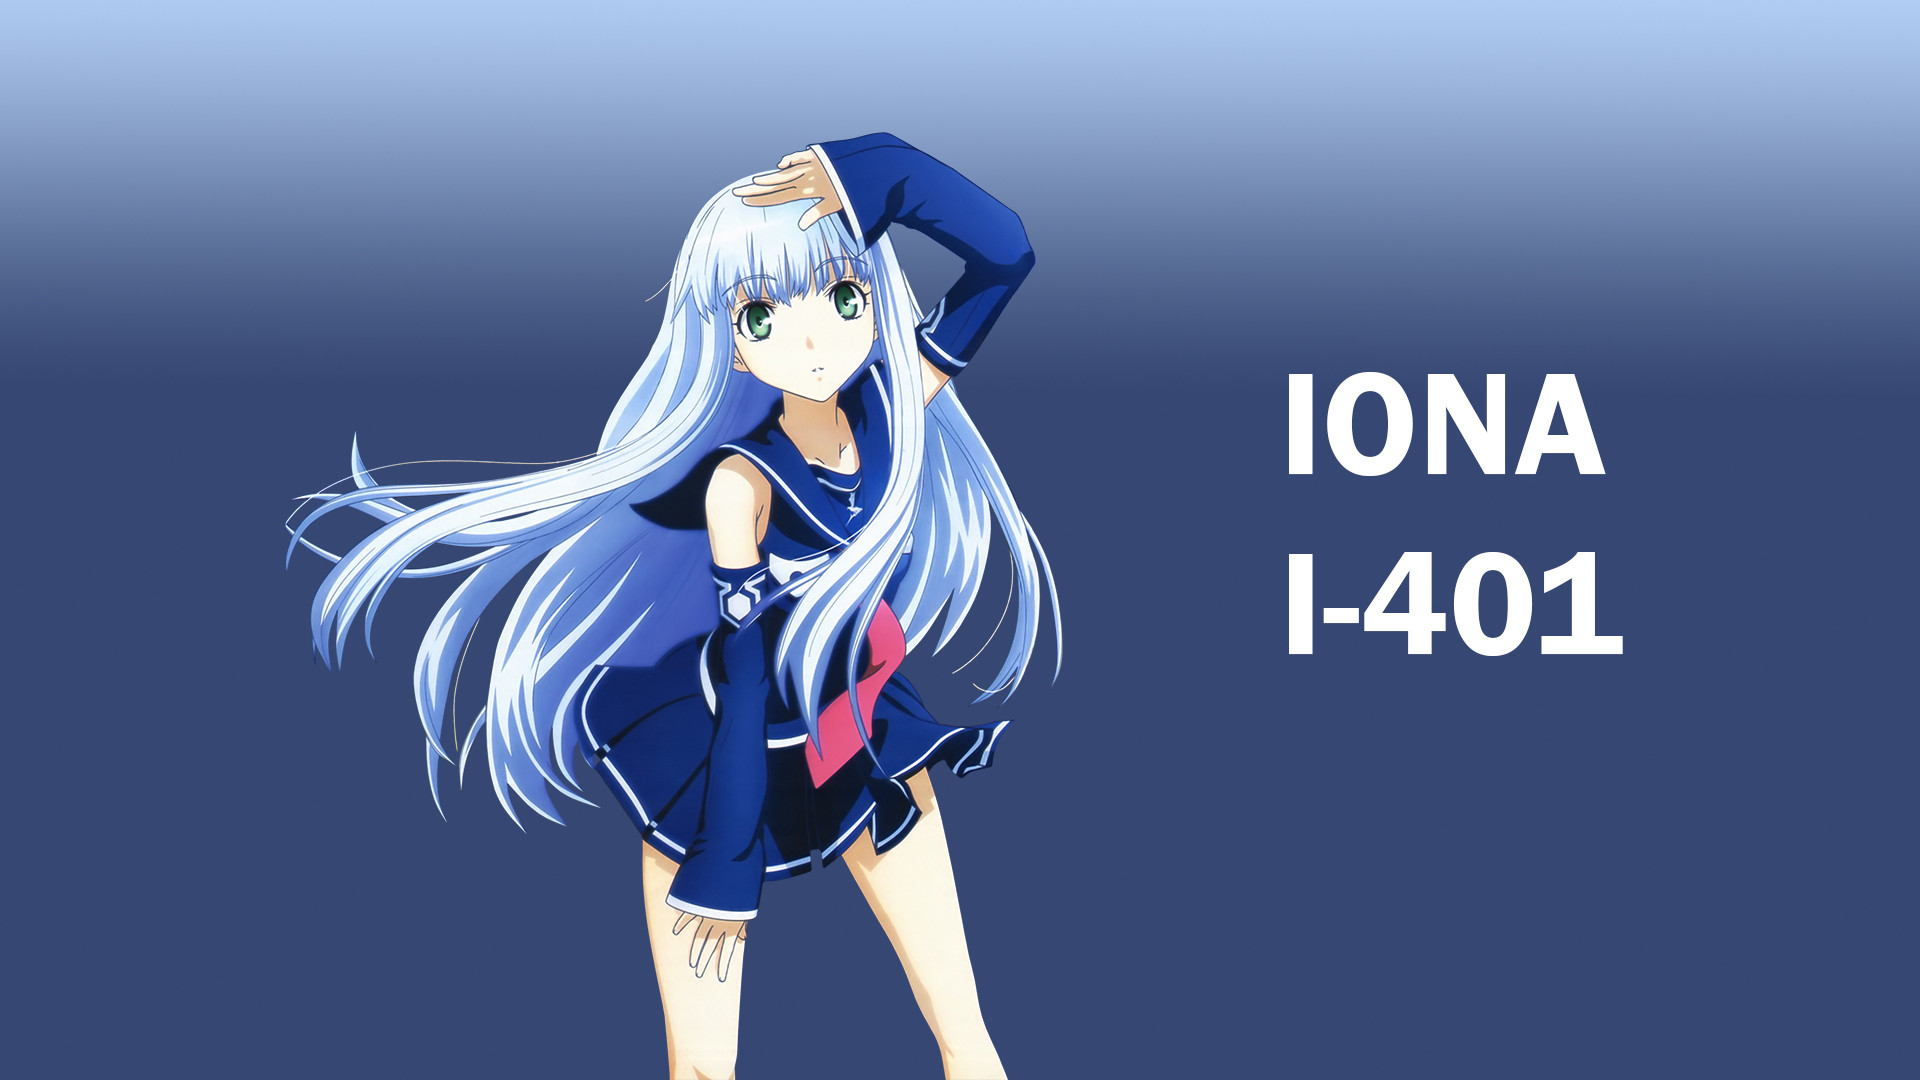 Iona, Arpeggio Of Blue Steel, Aoki Hagane No Arpeggio Wallpapers HD /  Desktop and Mobile Backgrounds